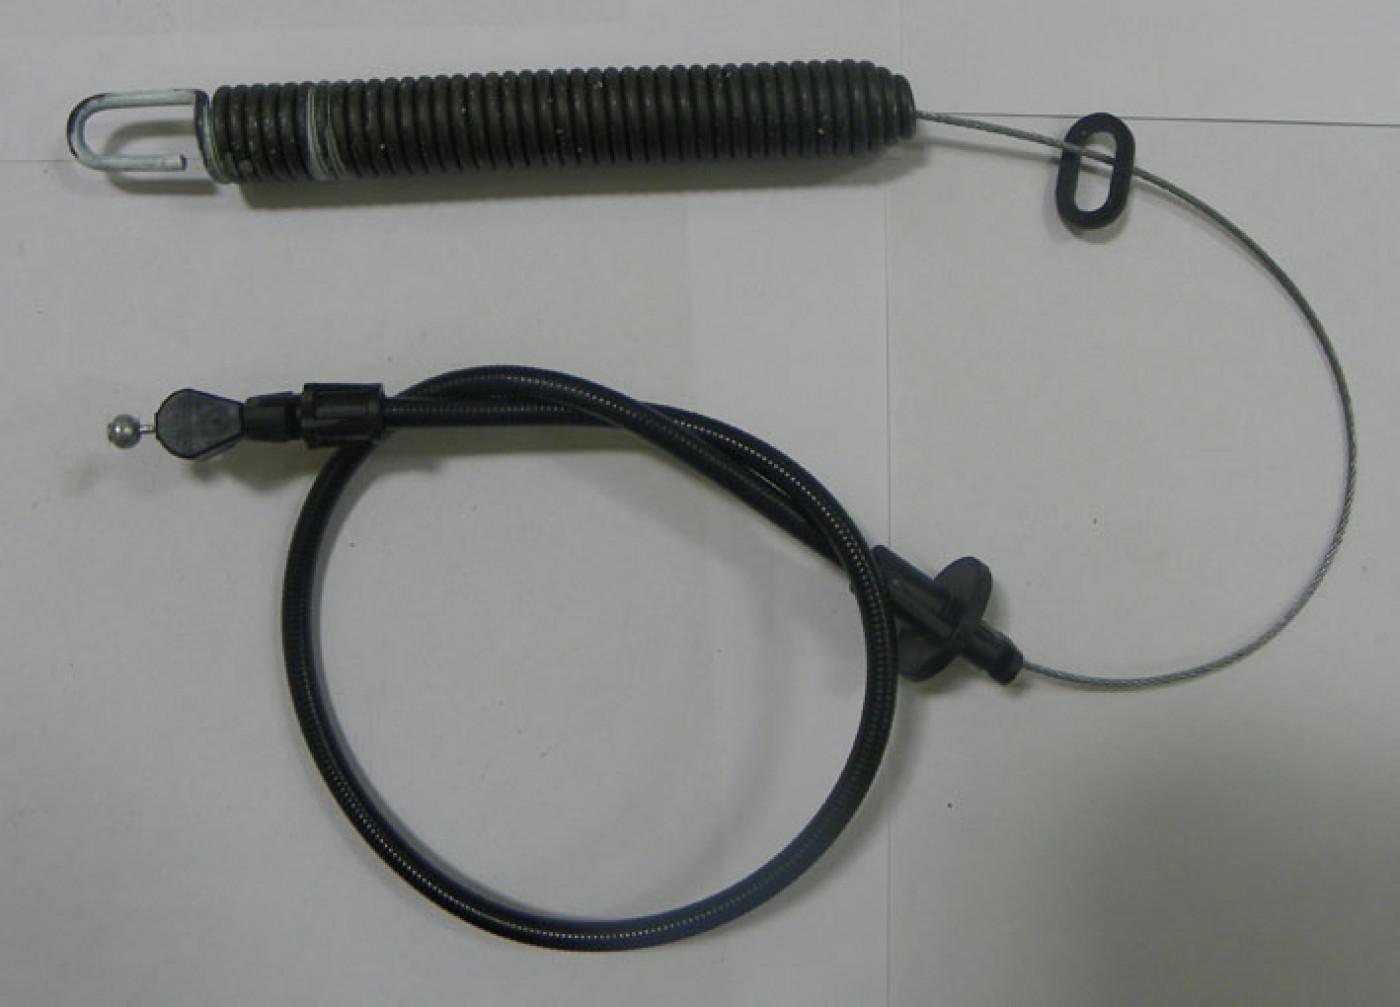 Lanko spojky TRAKTORY Husqvarna 176074 496mm x 890mm